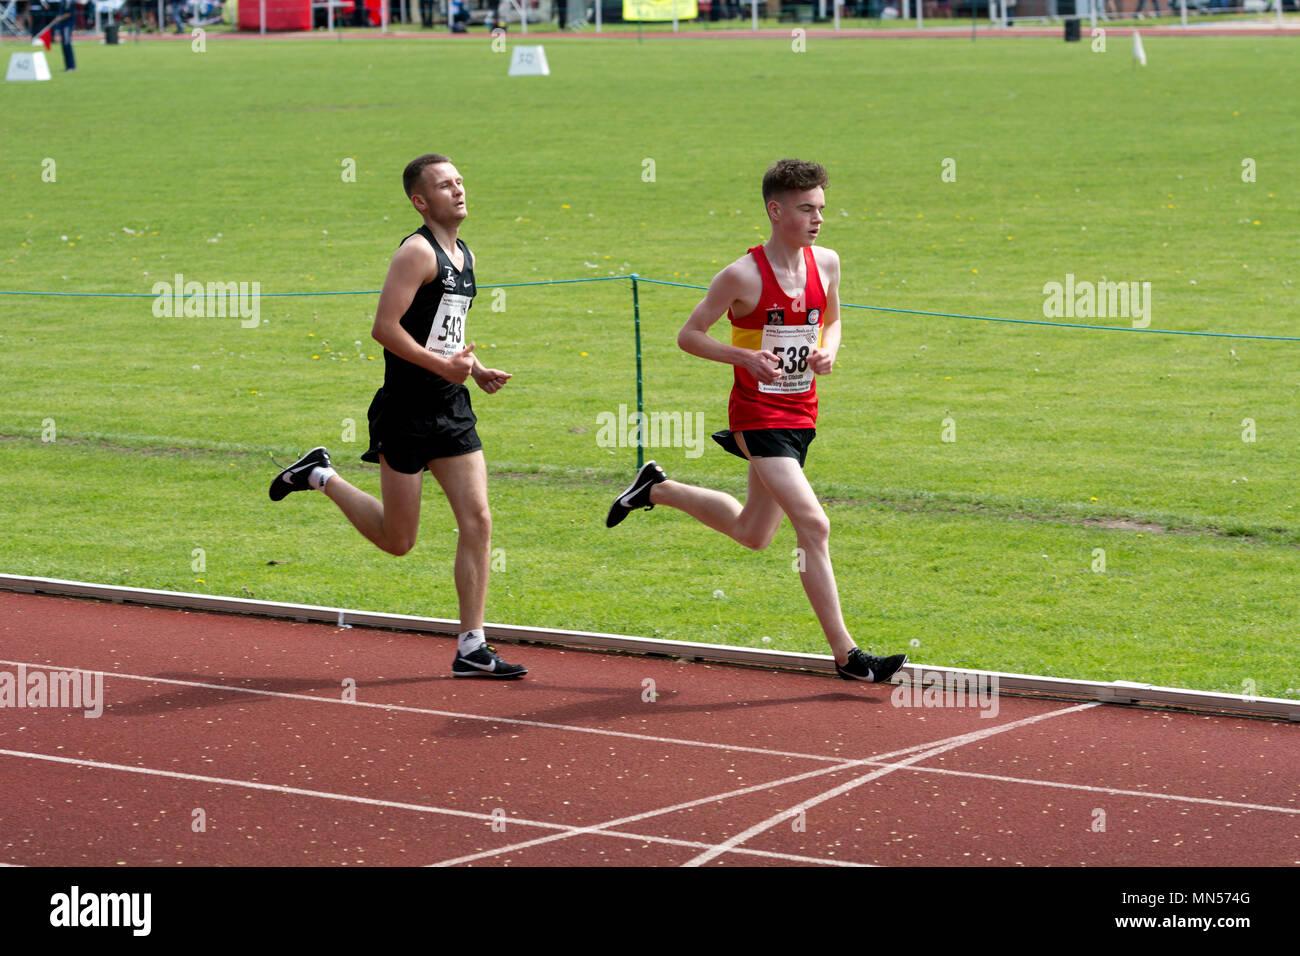 Runners in men`s 3000m race, Warwickshire County Championships, Nuneaton, UK - Stock Image